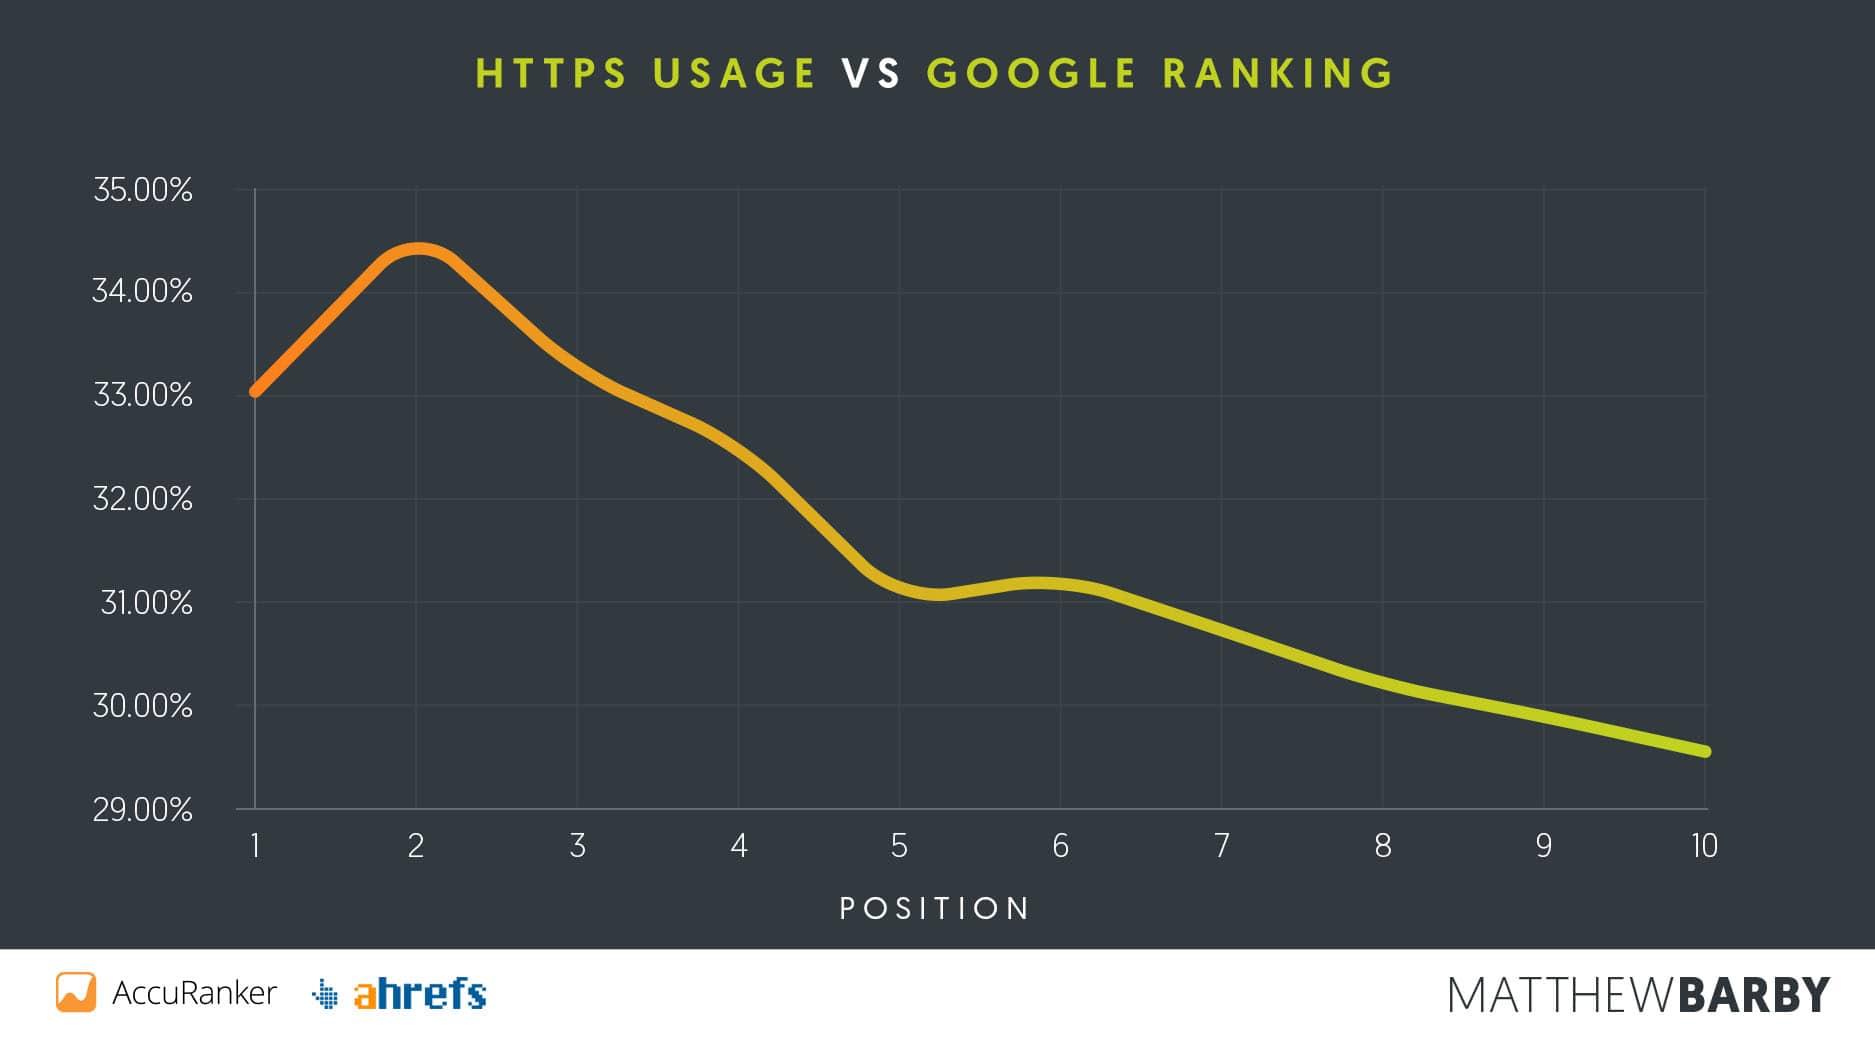 HTTPS gebruik vs Google ranking